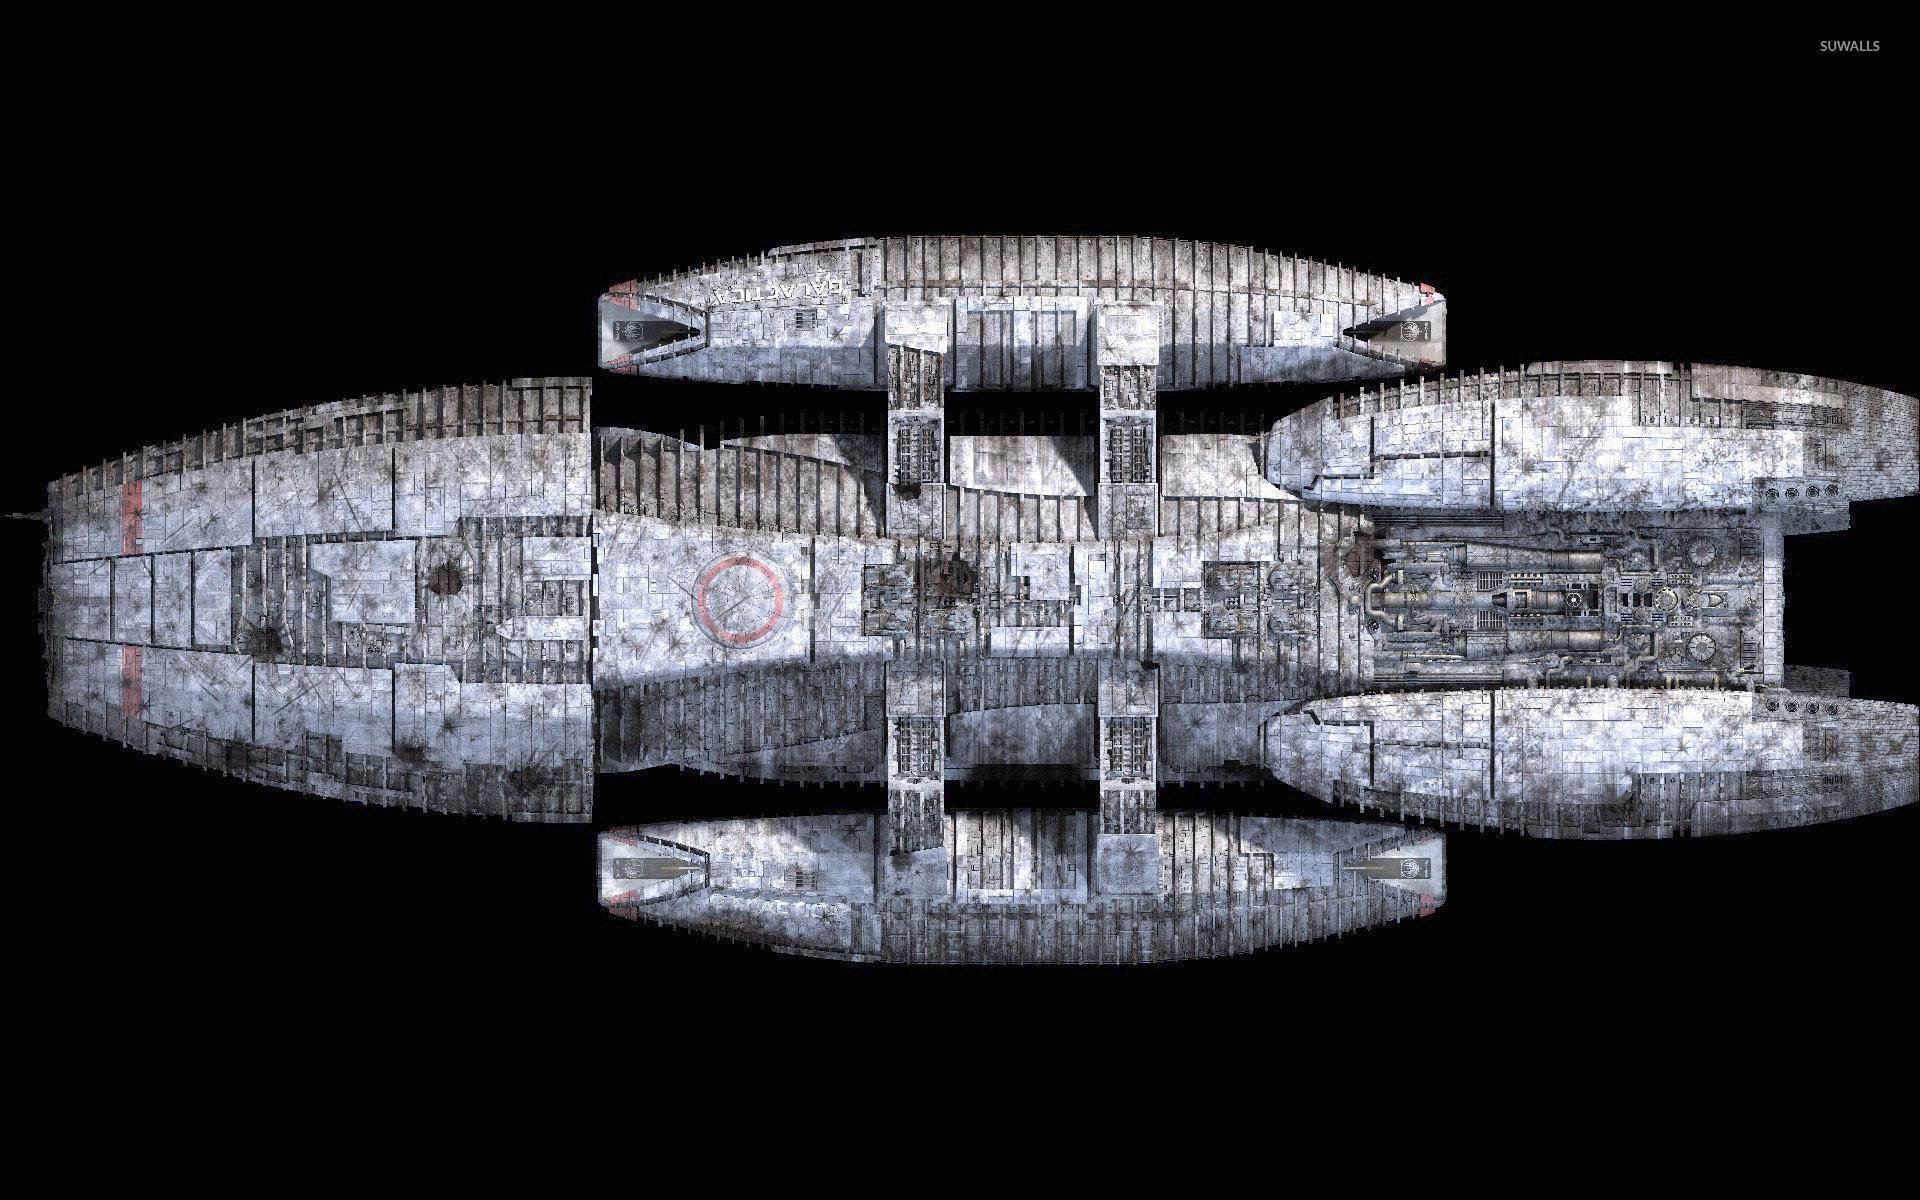 Battlestar Galactica spaceship [2] wallpaper jpg